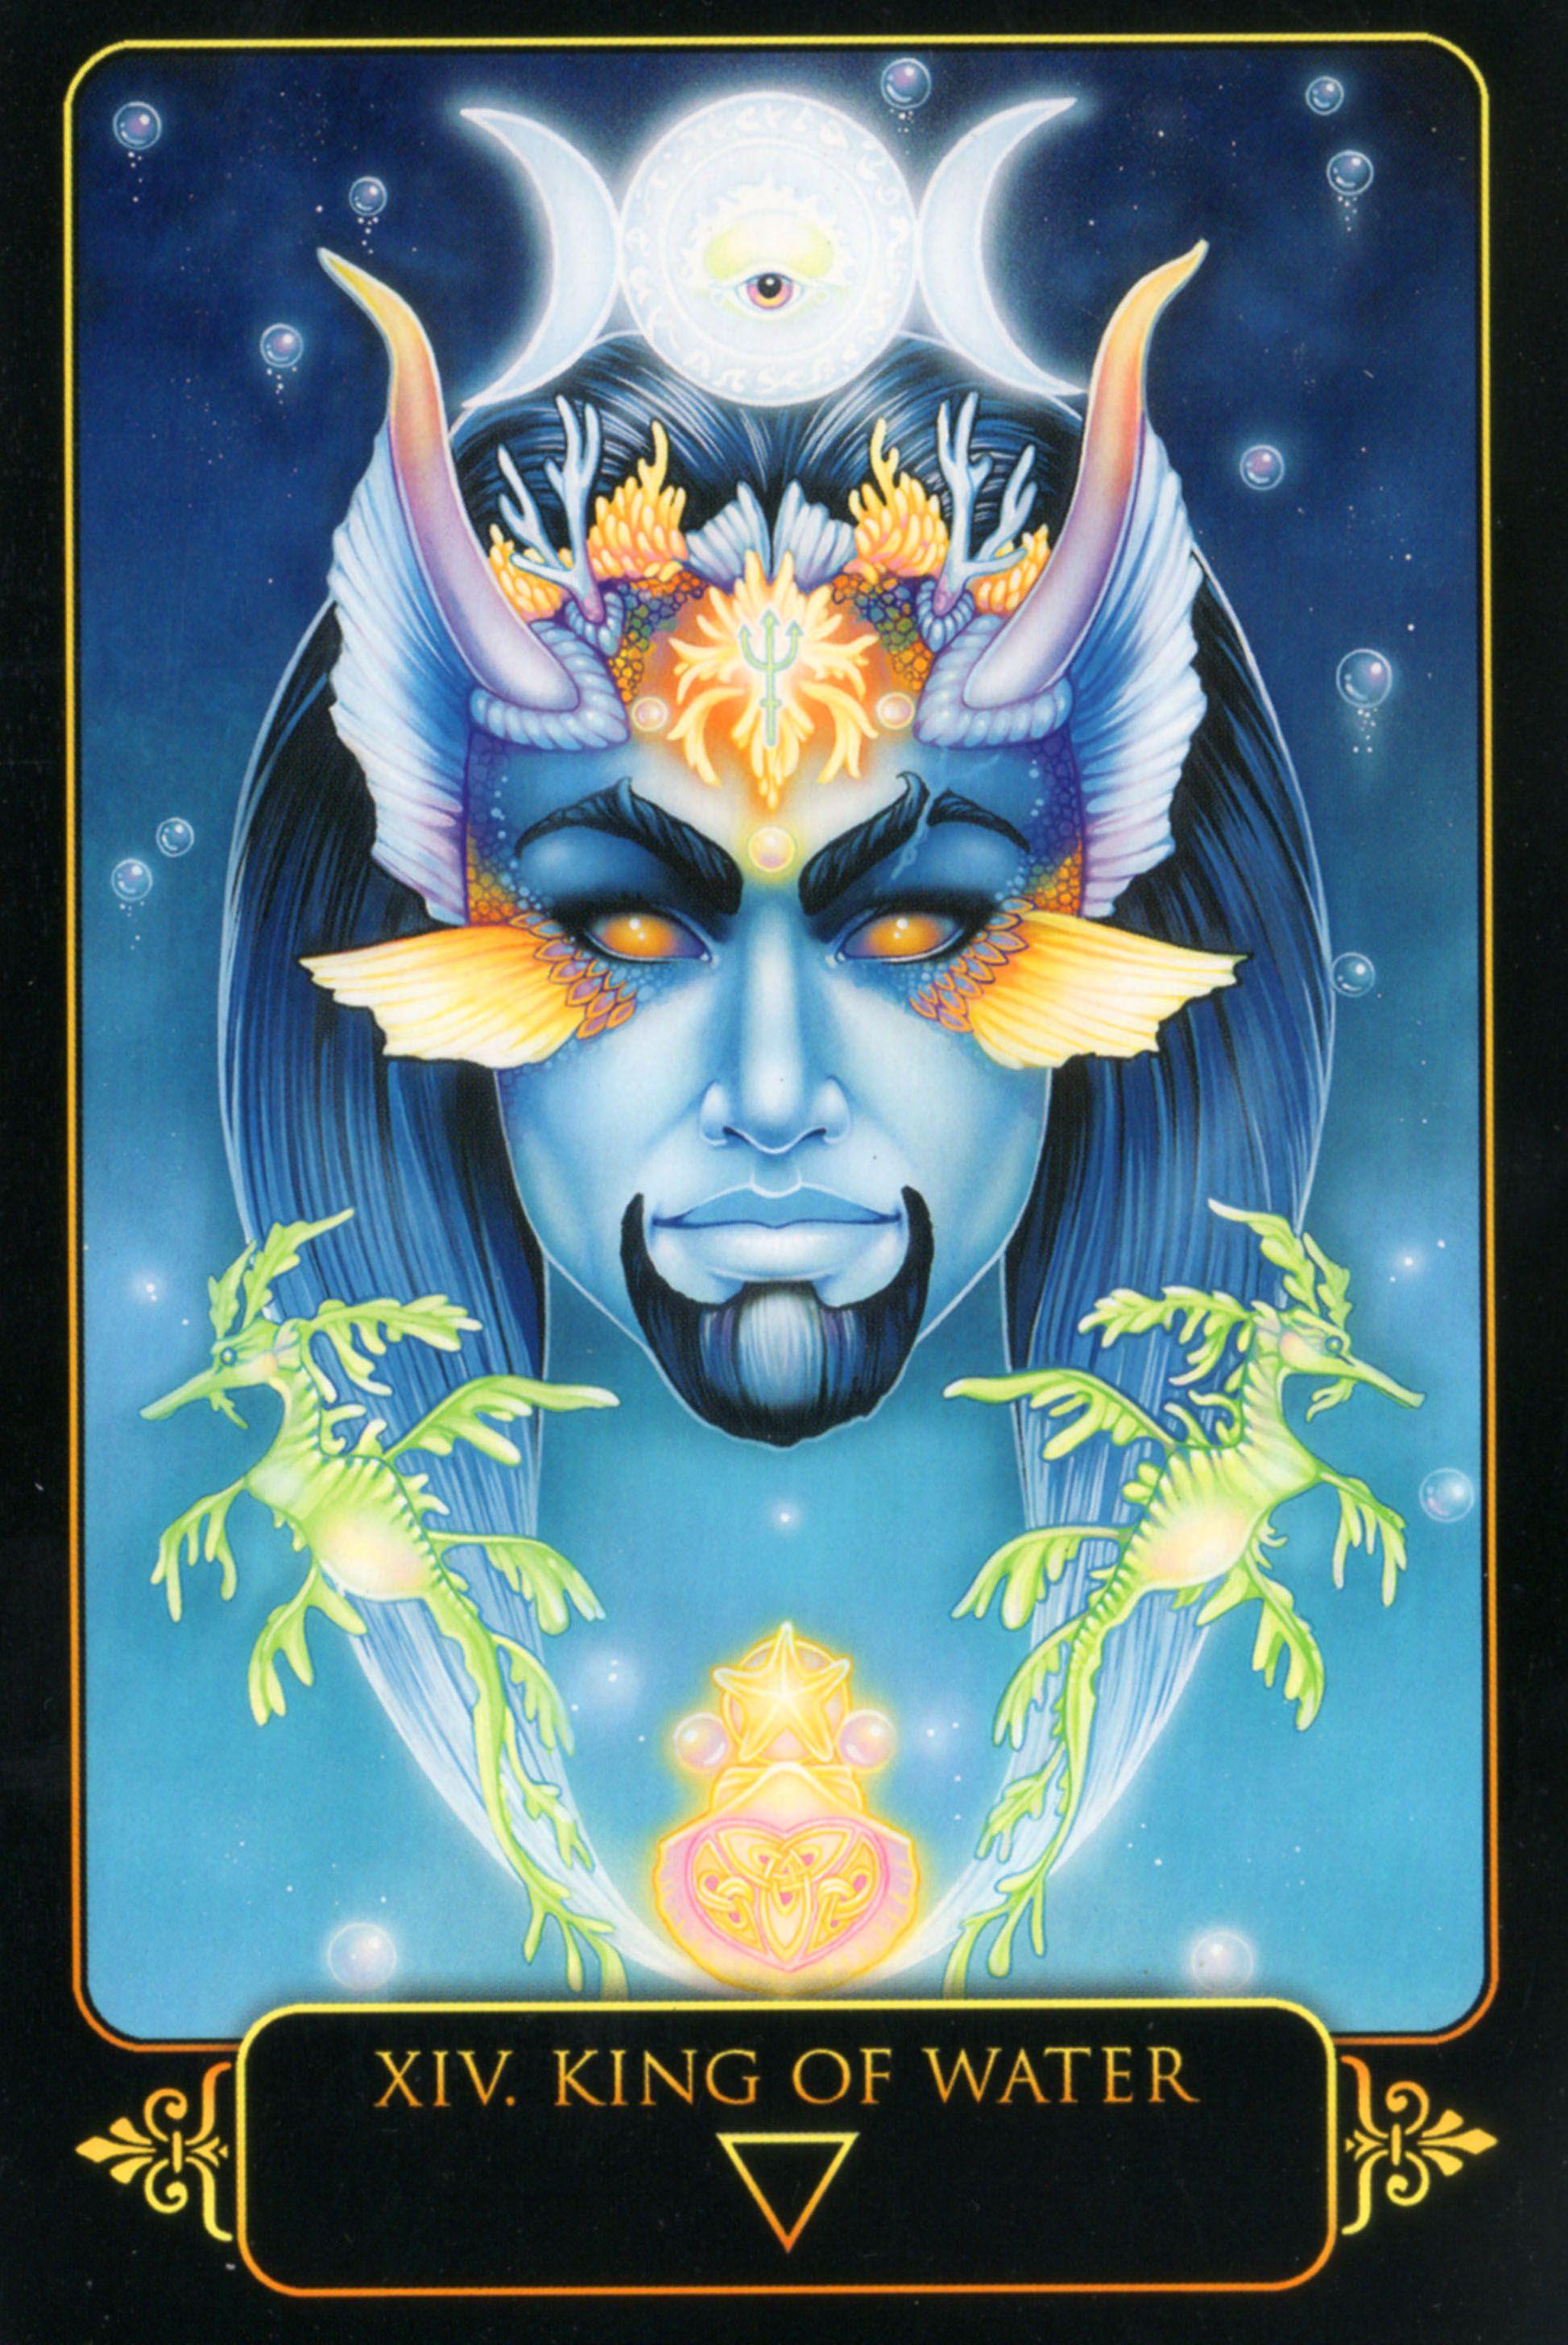 King Of Water Dreams Of Gaia Tarot By Ravynne Phelan Tarot By Cecelia Astro Tarot Tarot Art